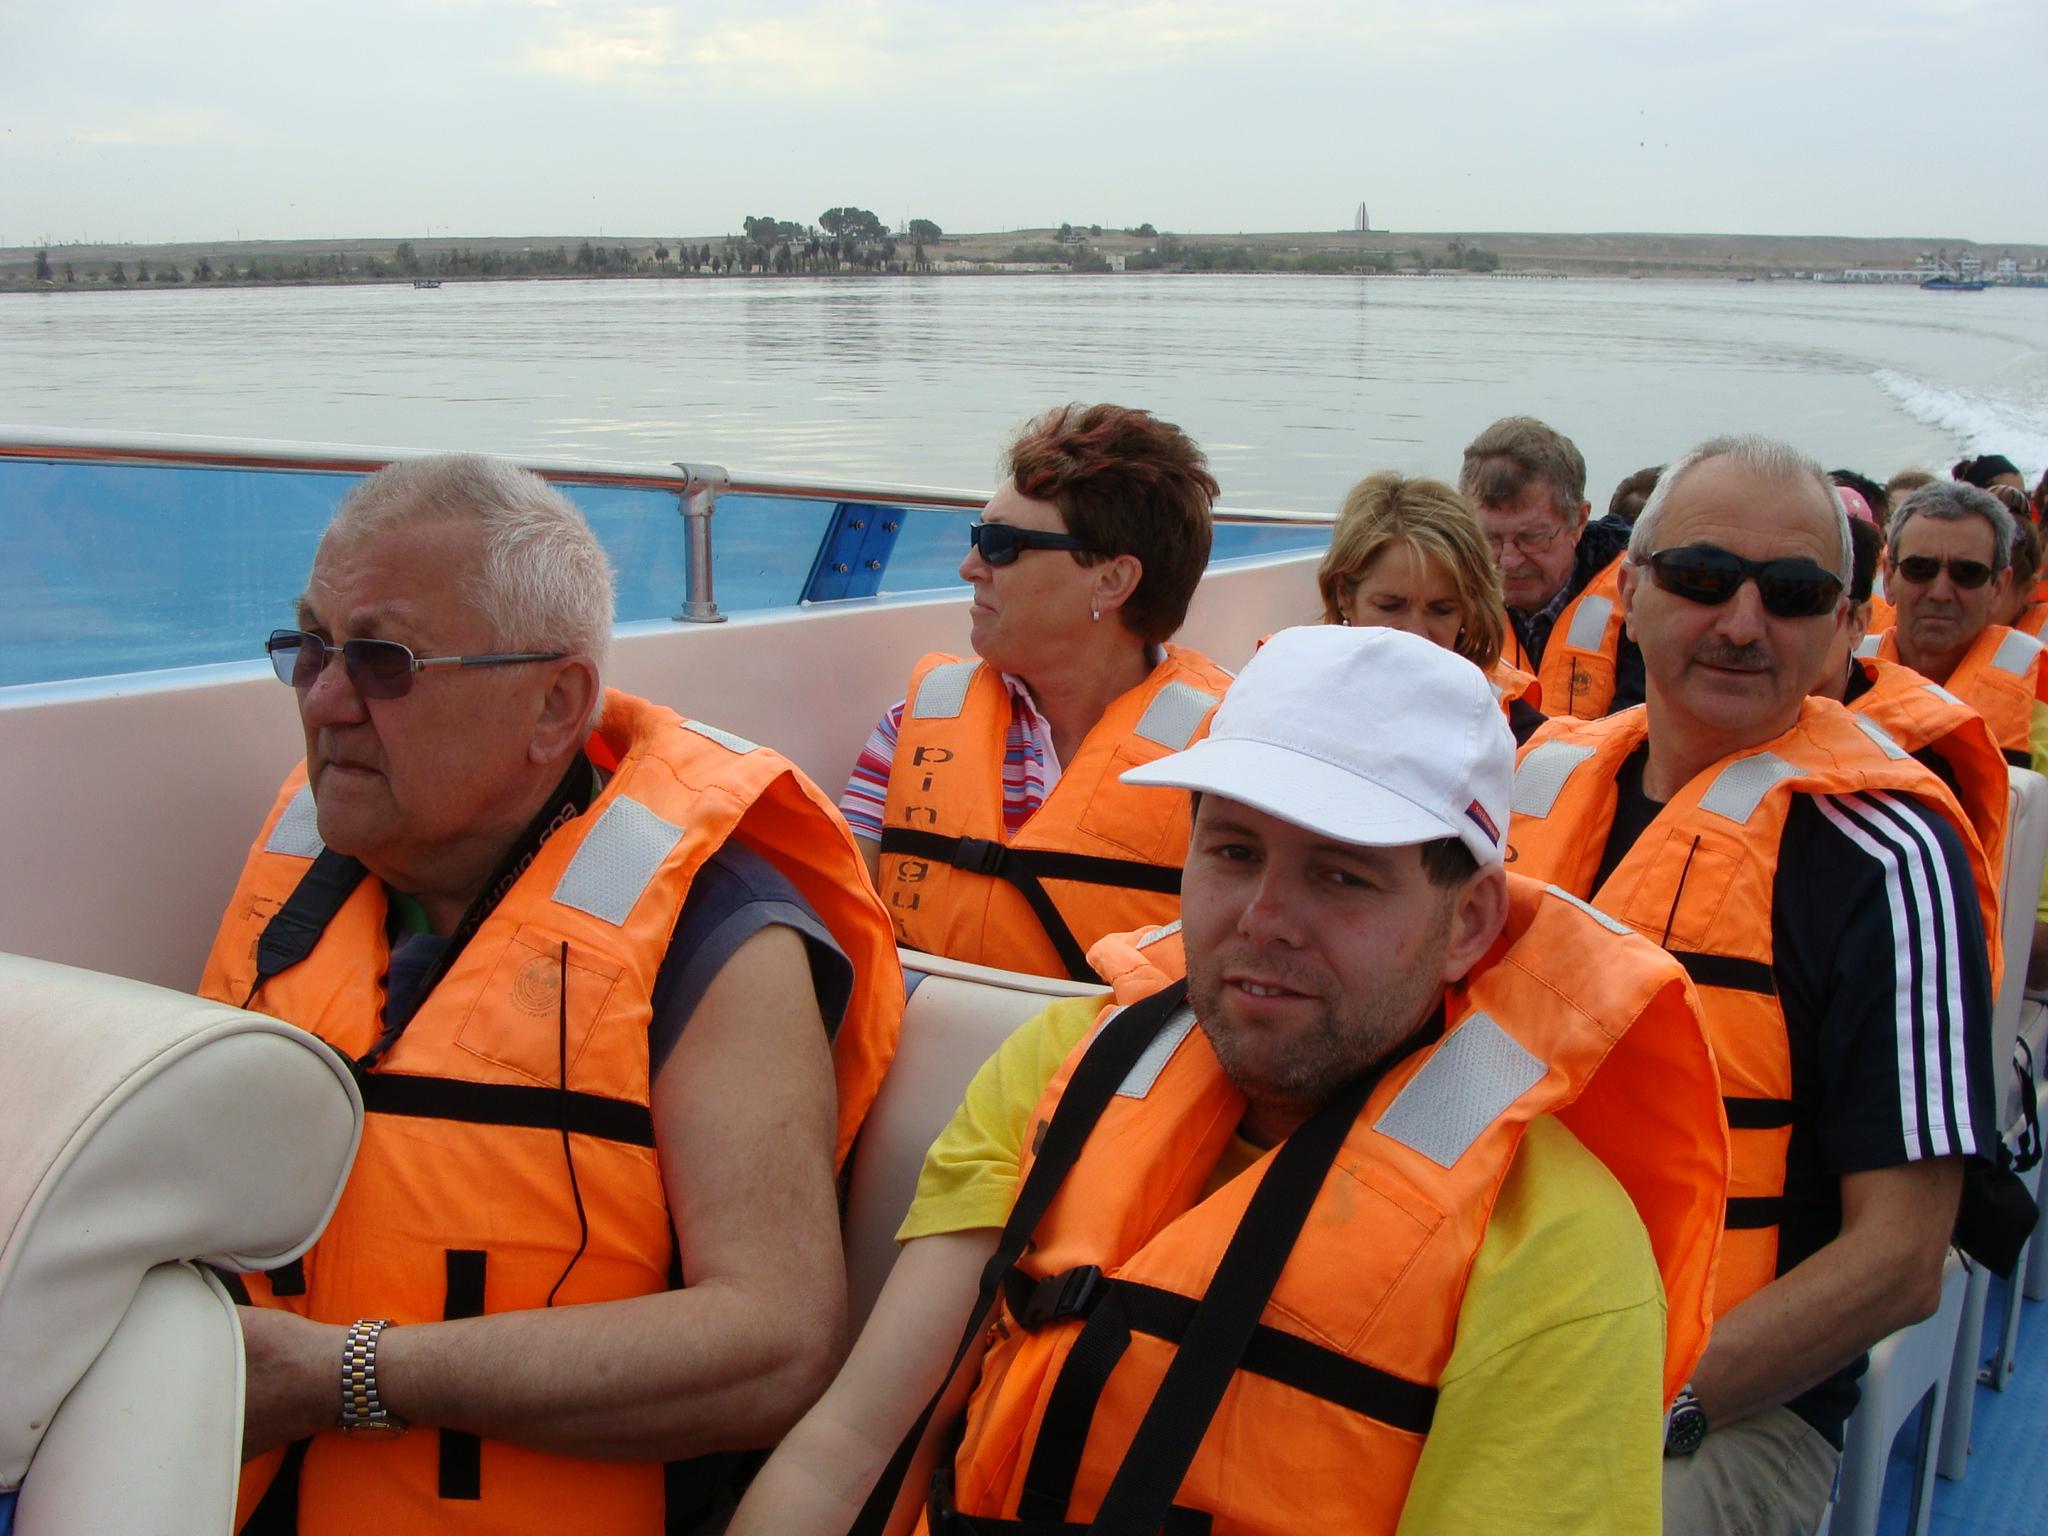 Paracas - cesta na Islas Balestas 22. 2. 2011